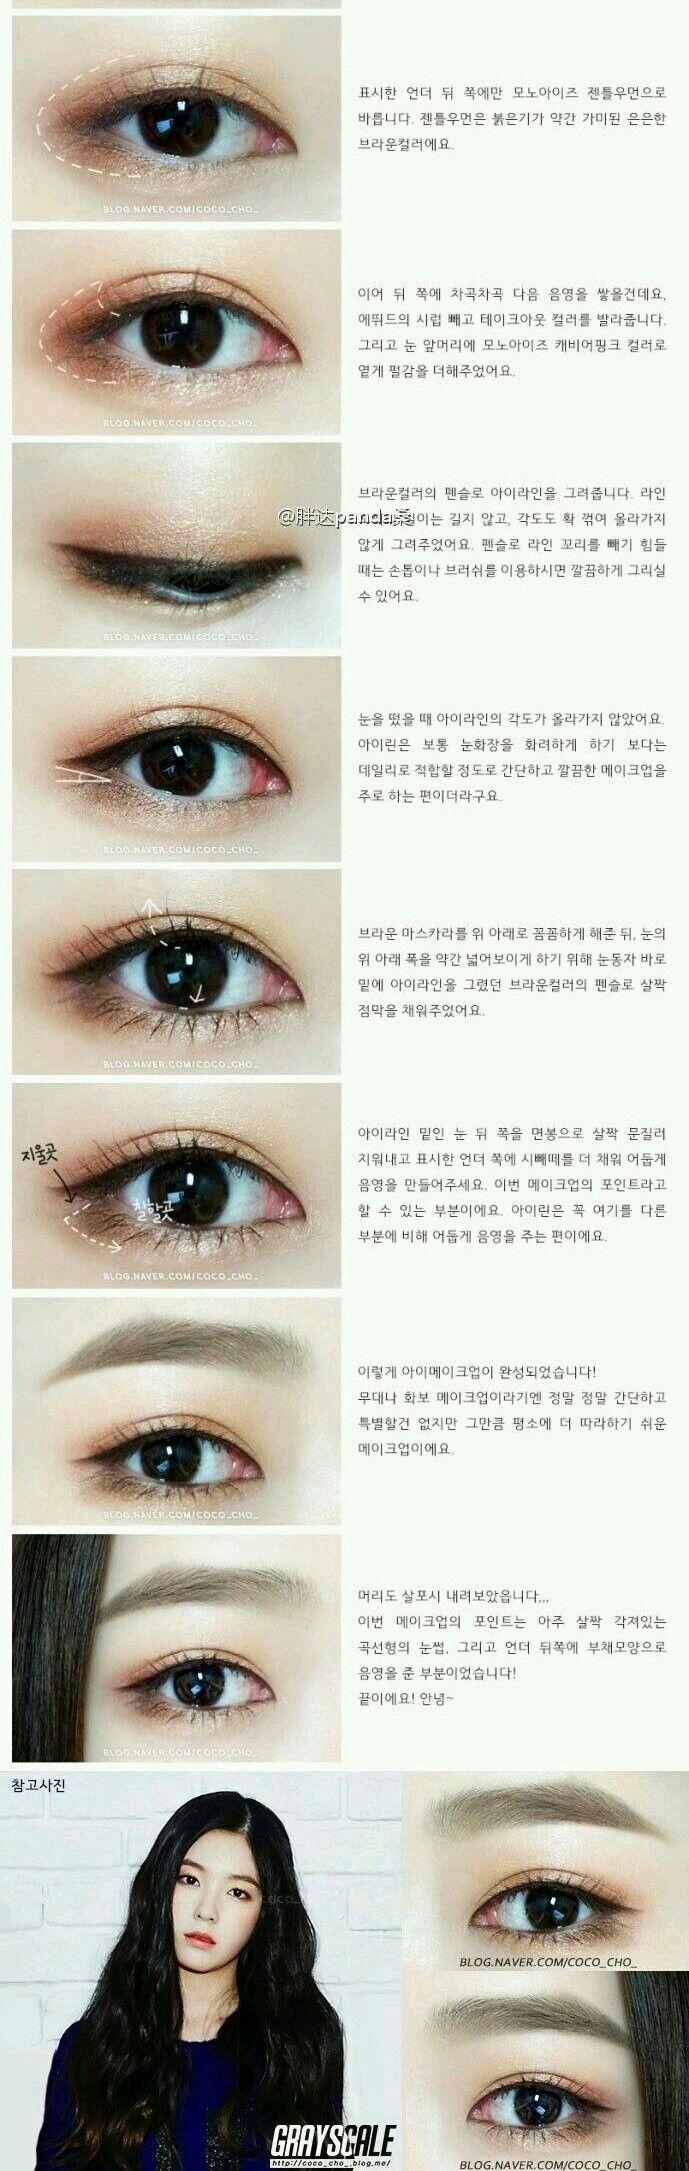 Yellow brown n orange makeup pinterest make up korean makeup tutorial feminine hanbok makeup by heizle korean makeup baditri Image collections